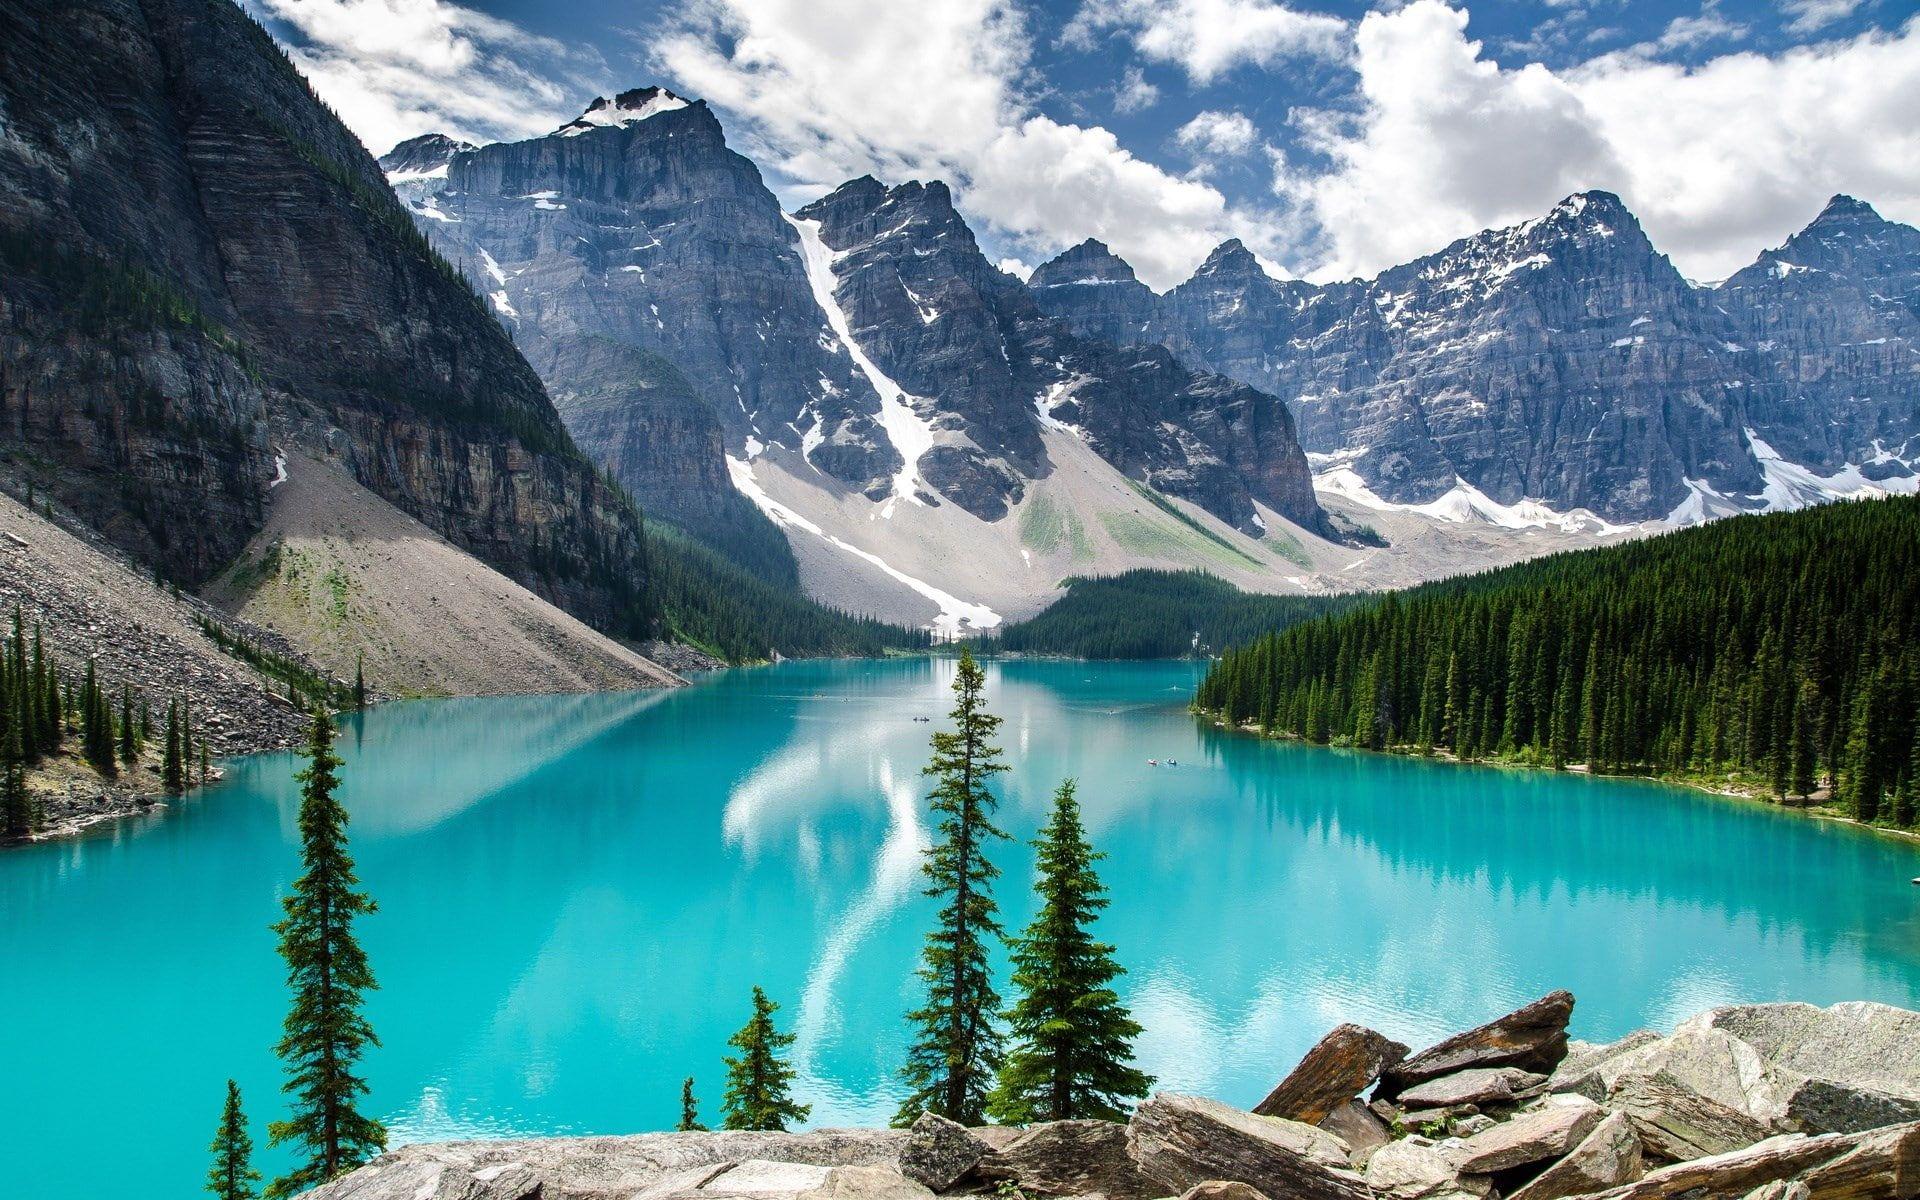 Pc Backgrounds Hd Nature 1920x1200 1080p Wallpaper Hdwallpaper Desktop In 2020 Nature Images Most Beautiful Places Nature Wallpaper